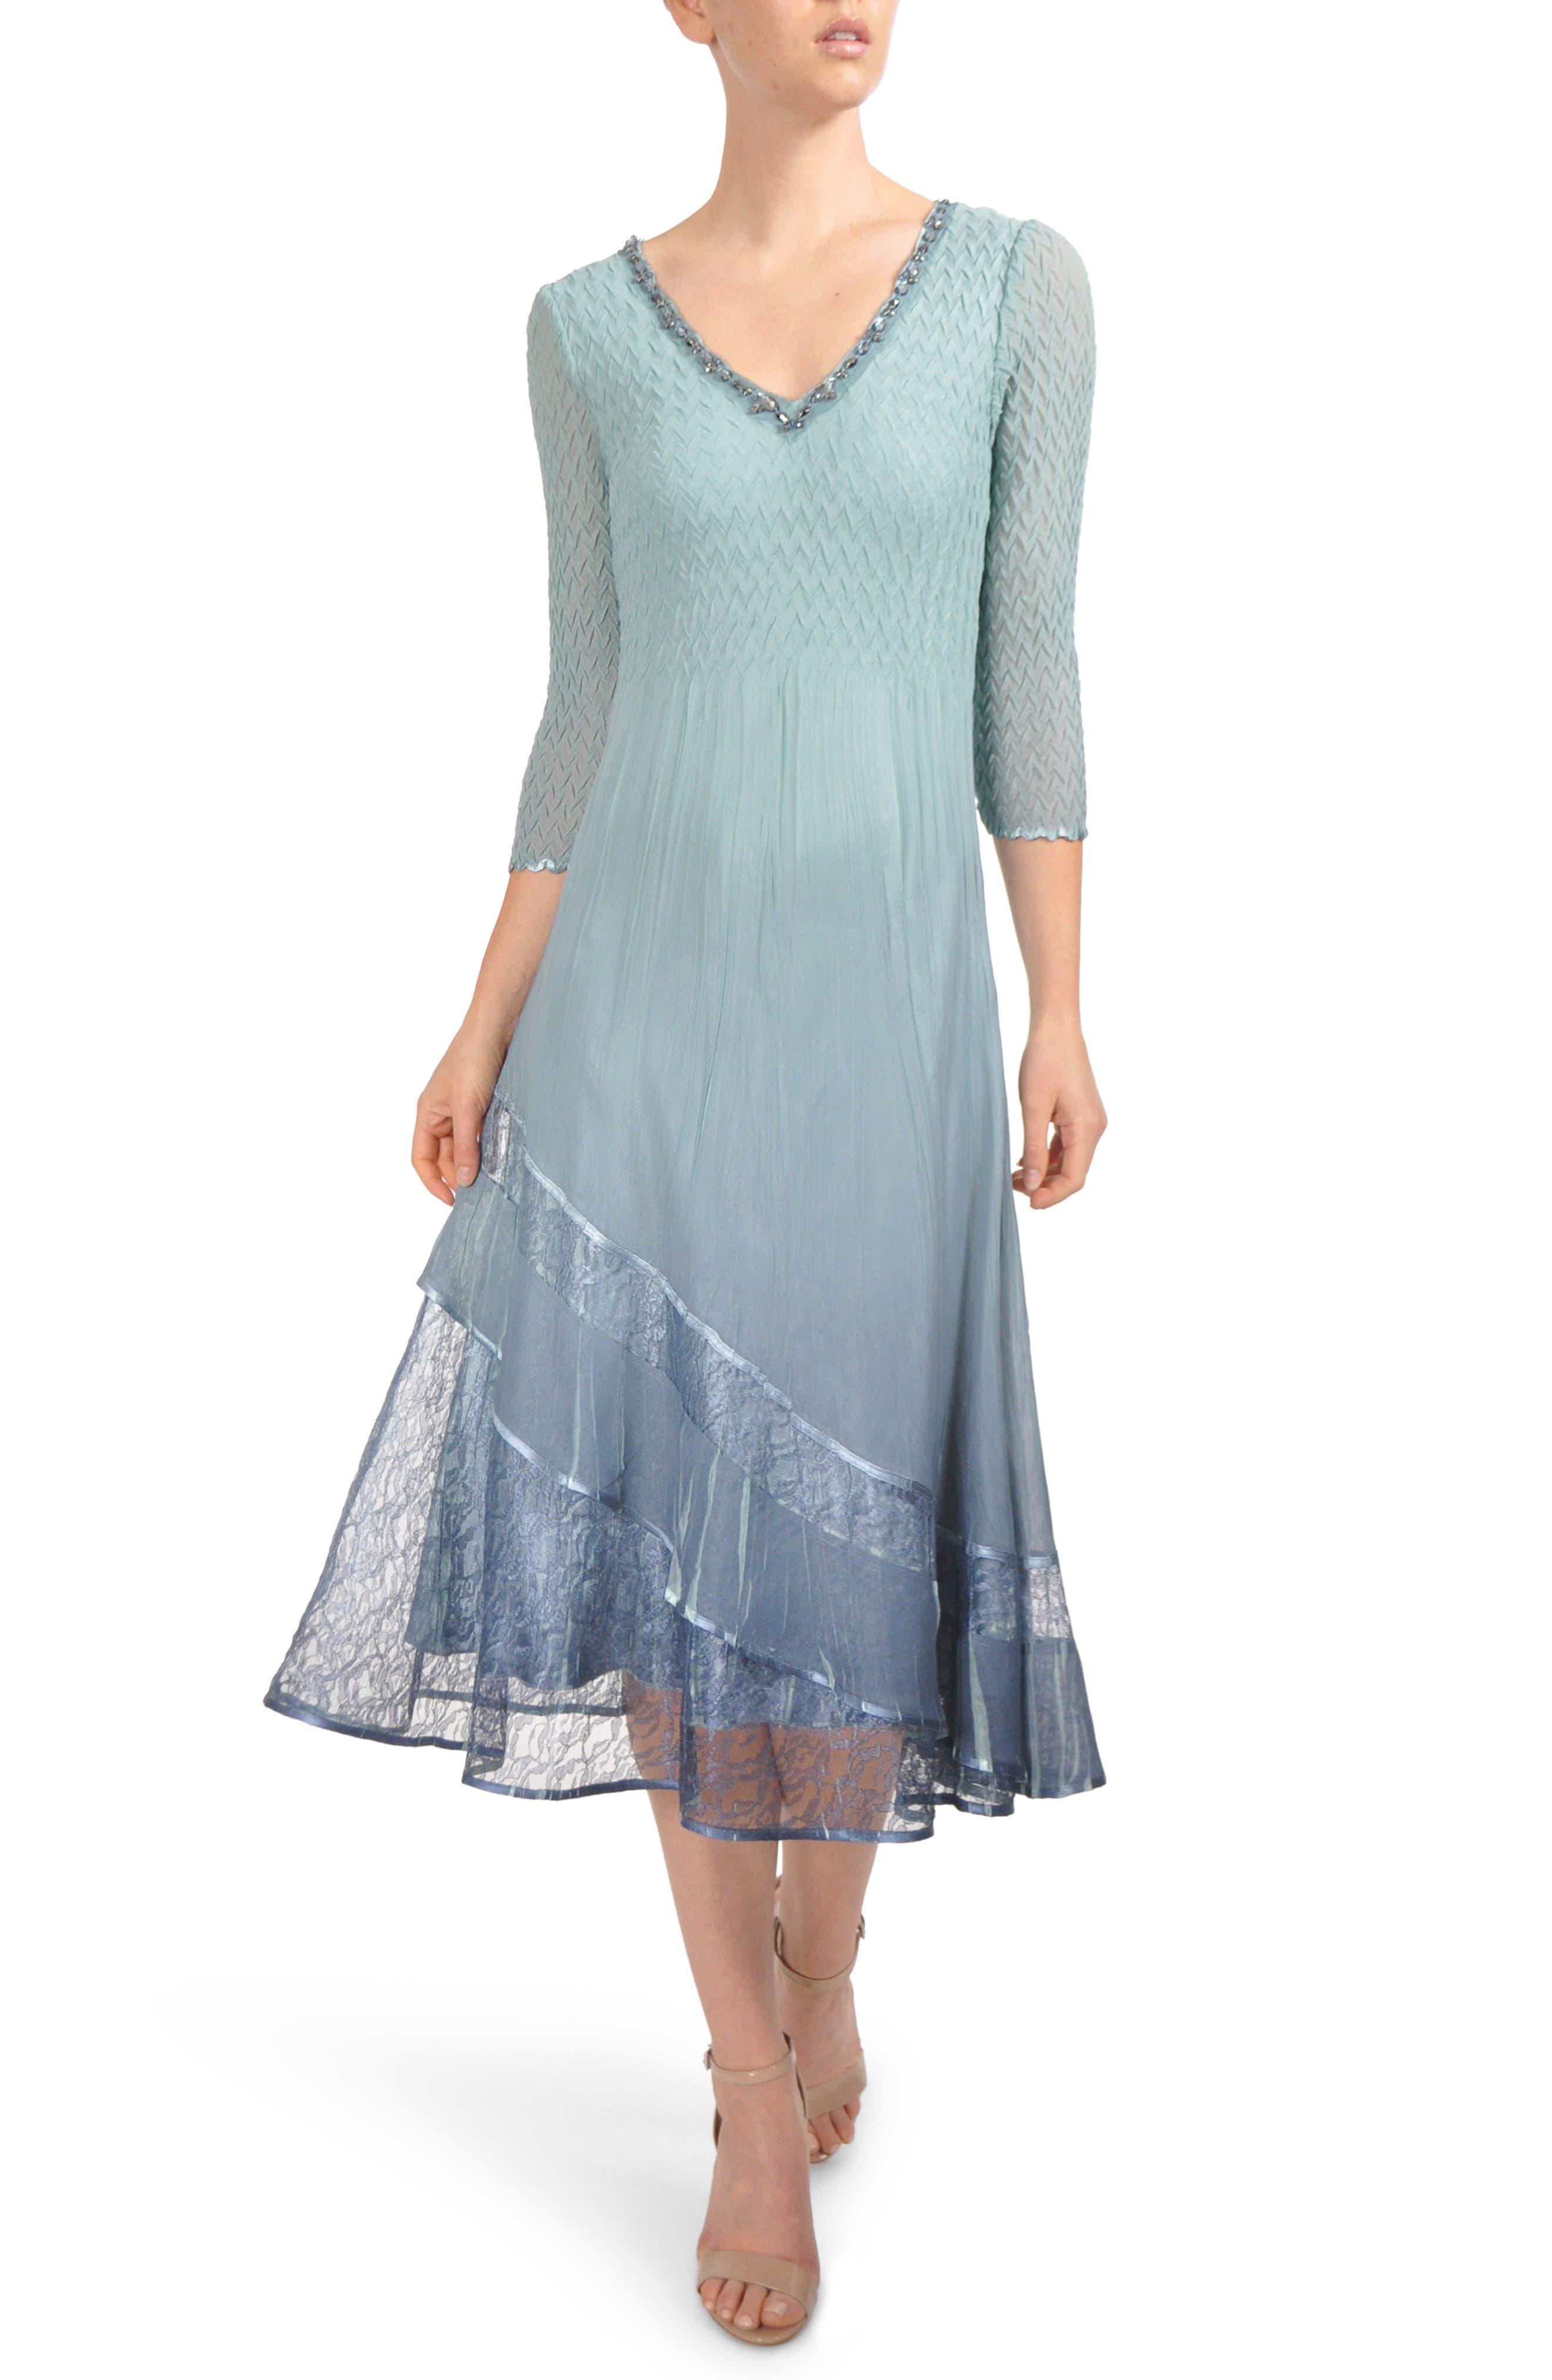 Beaded Neck Tier Hem Dress,                             Main thumbnail 1, color,                             Ocean Blue Night Ombre